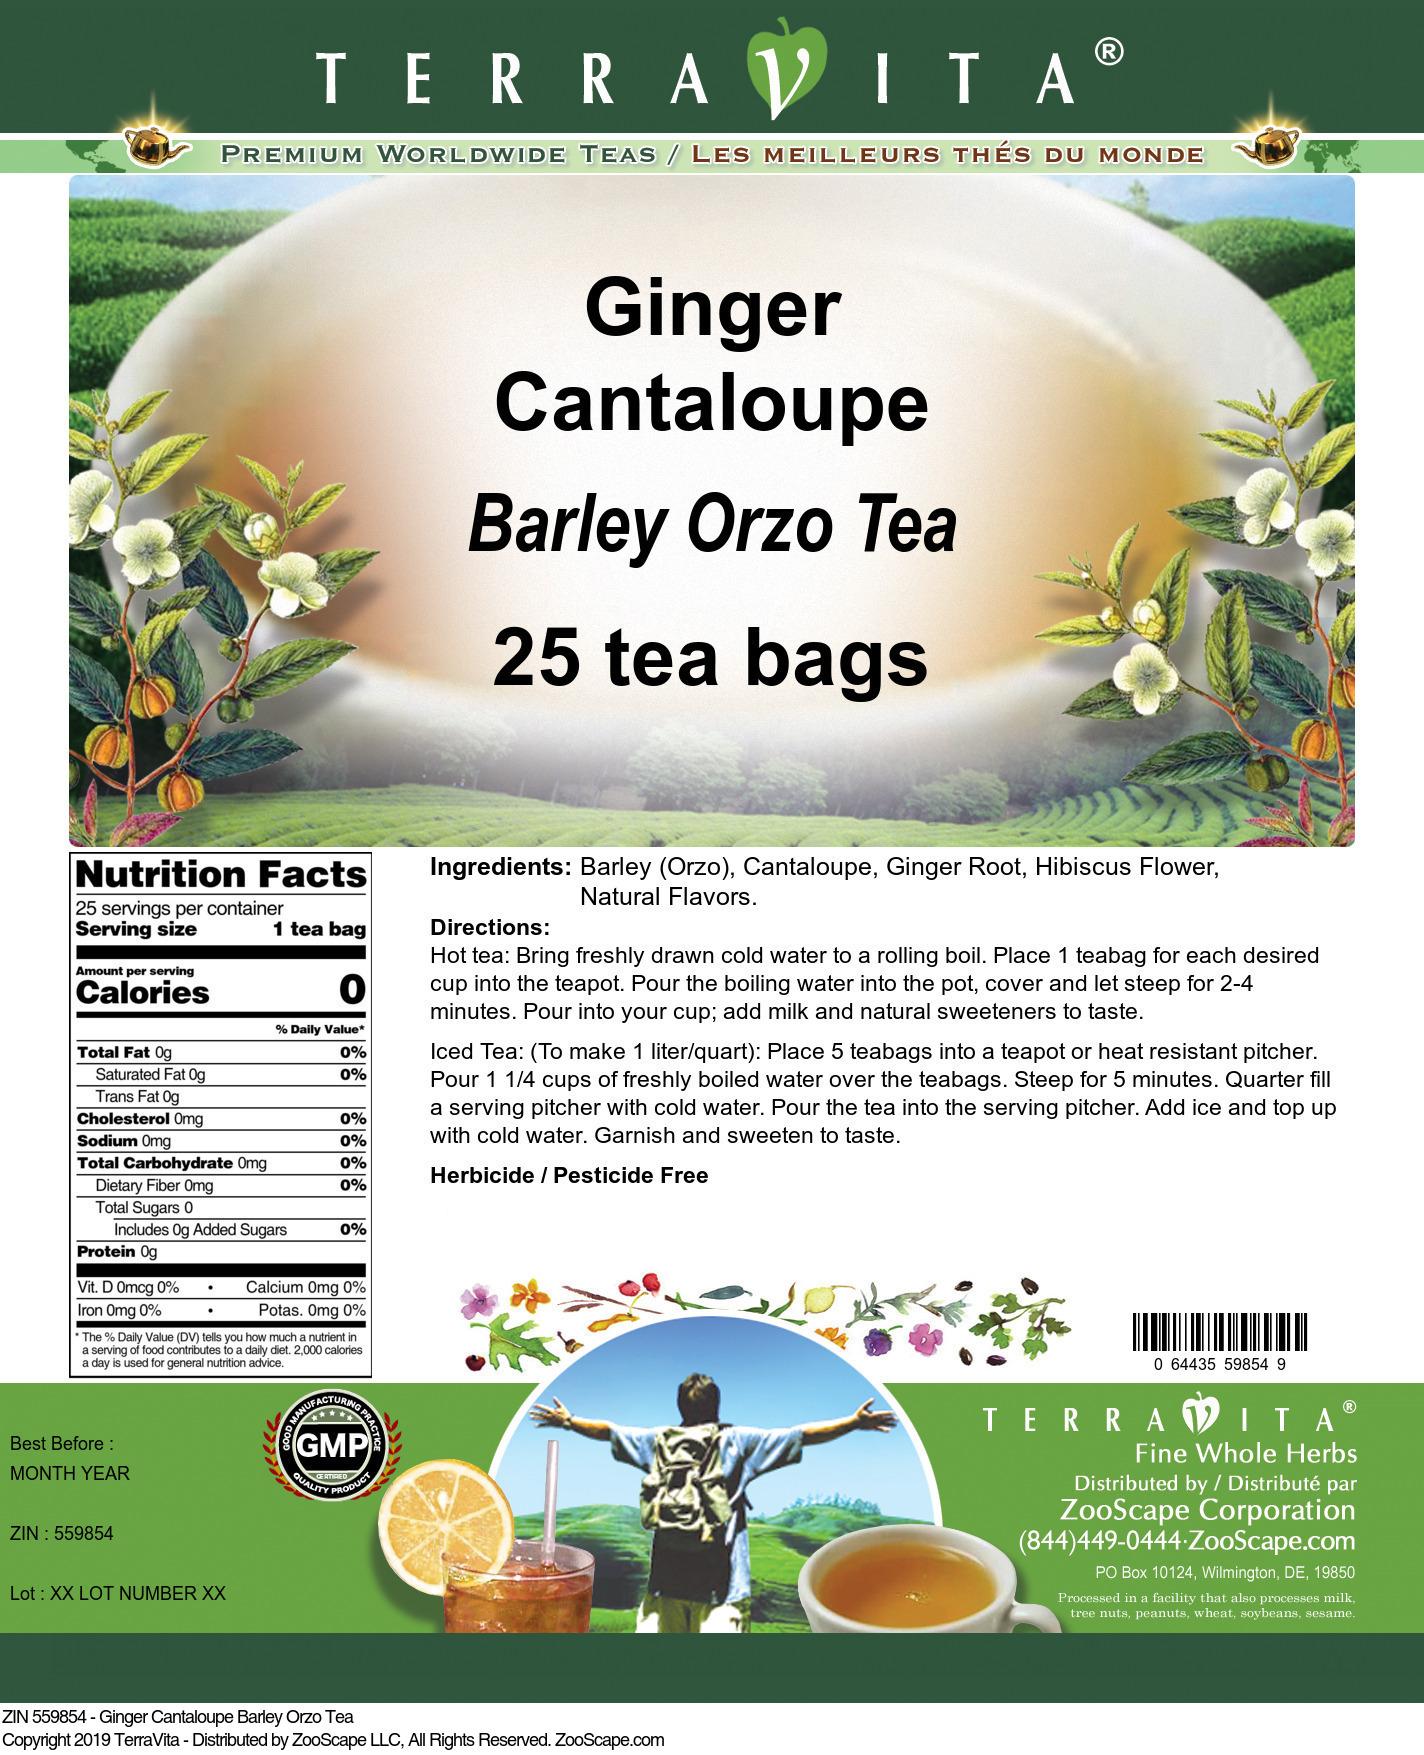 Ginger Cantaloupe Barley Orzo